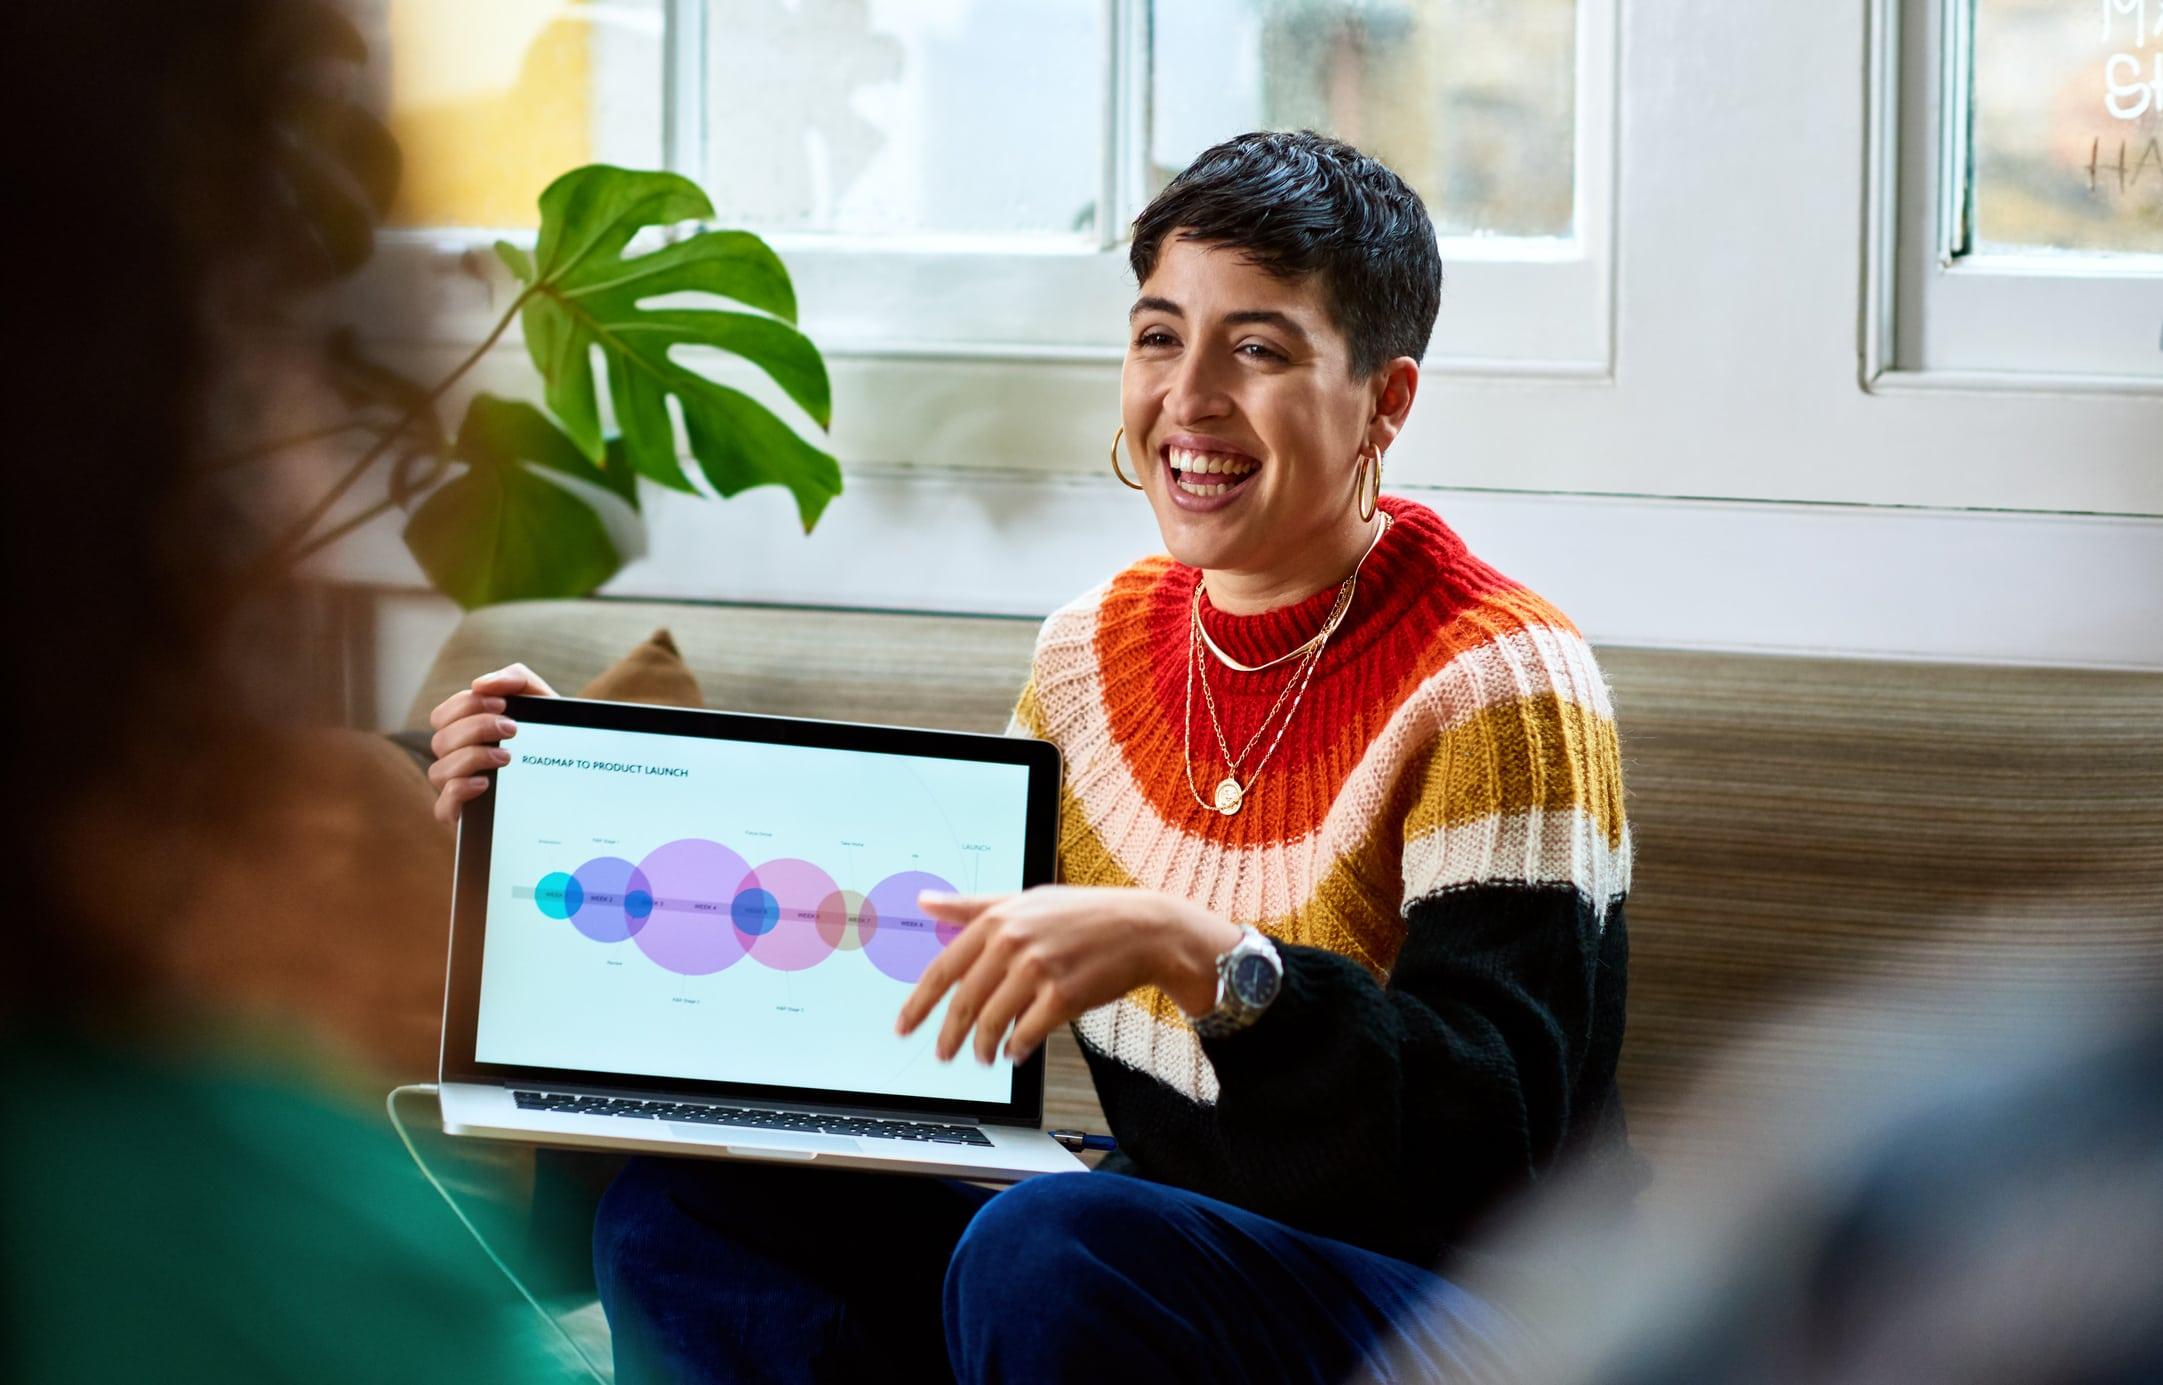 startup-ideen innovation frau laptop